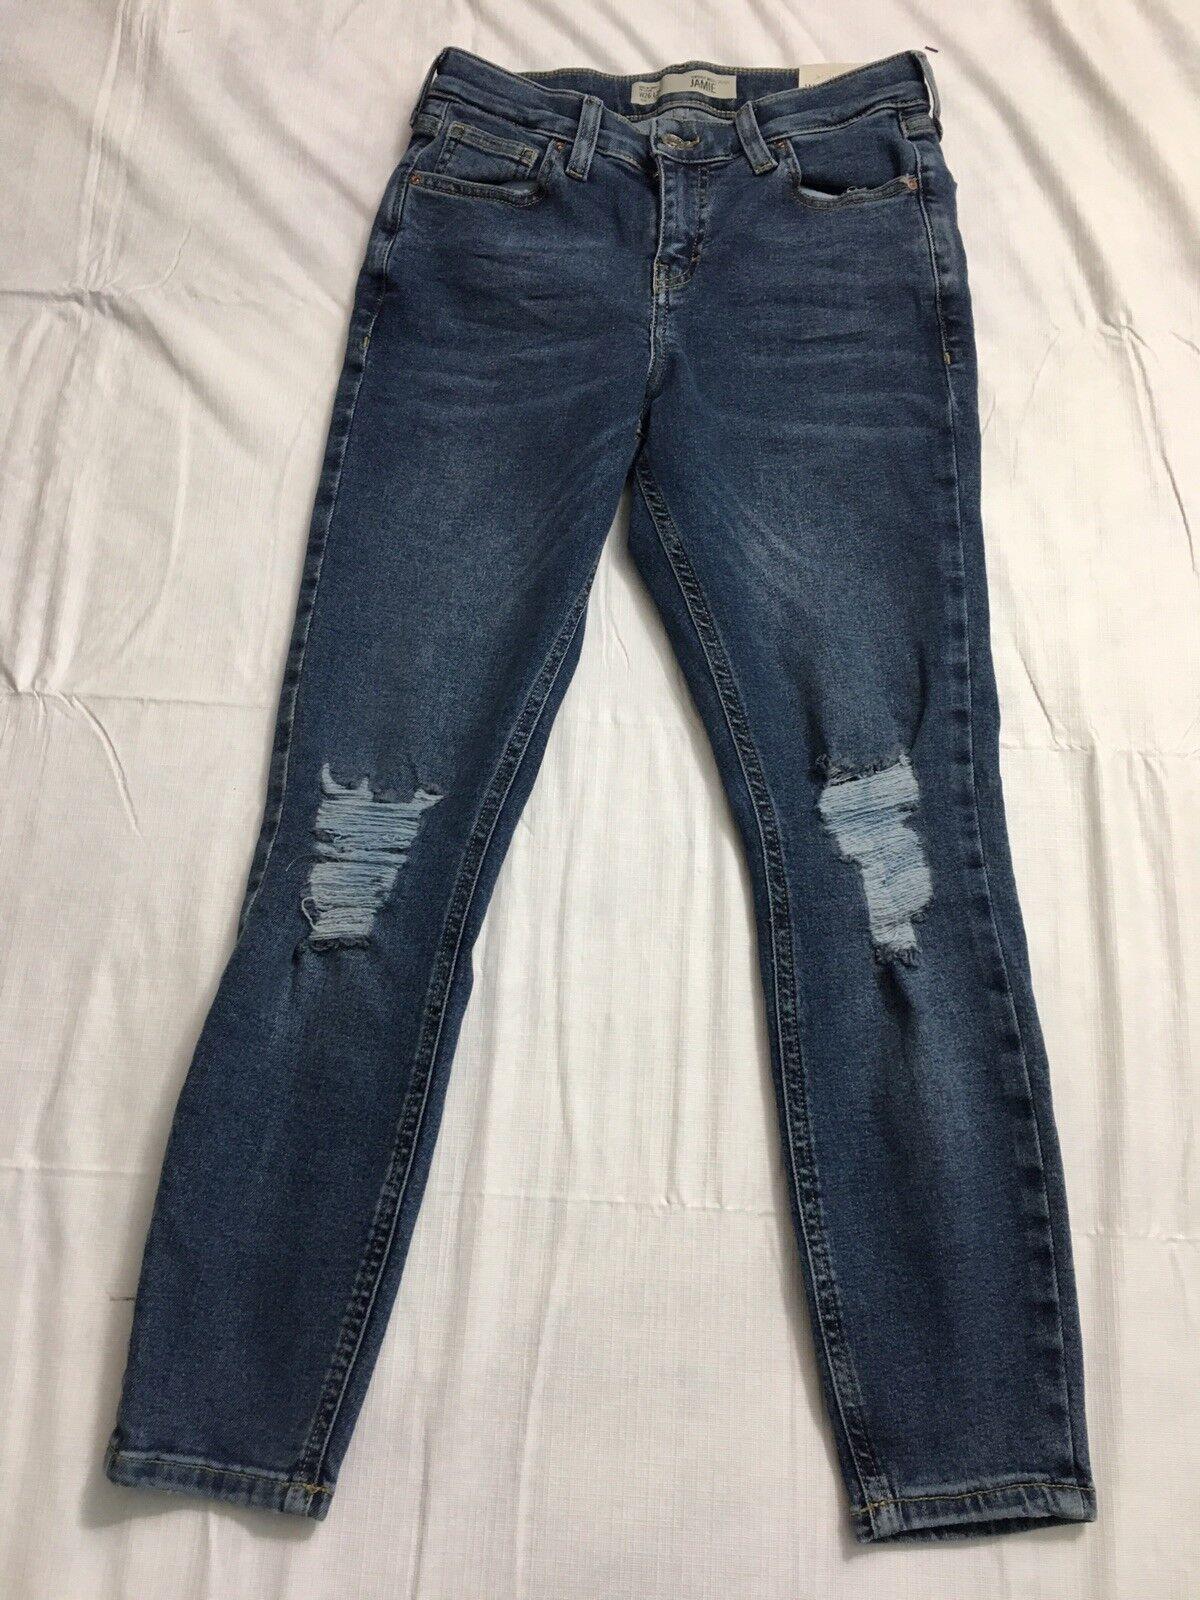 Topshop Petite Jamie High Waist Ankle Grazer Jeans 24x24 Skinny Leg Distressed